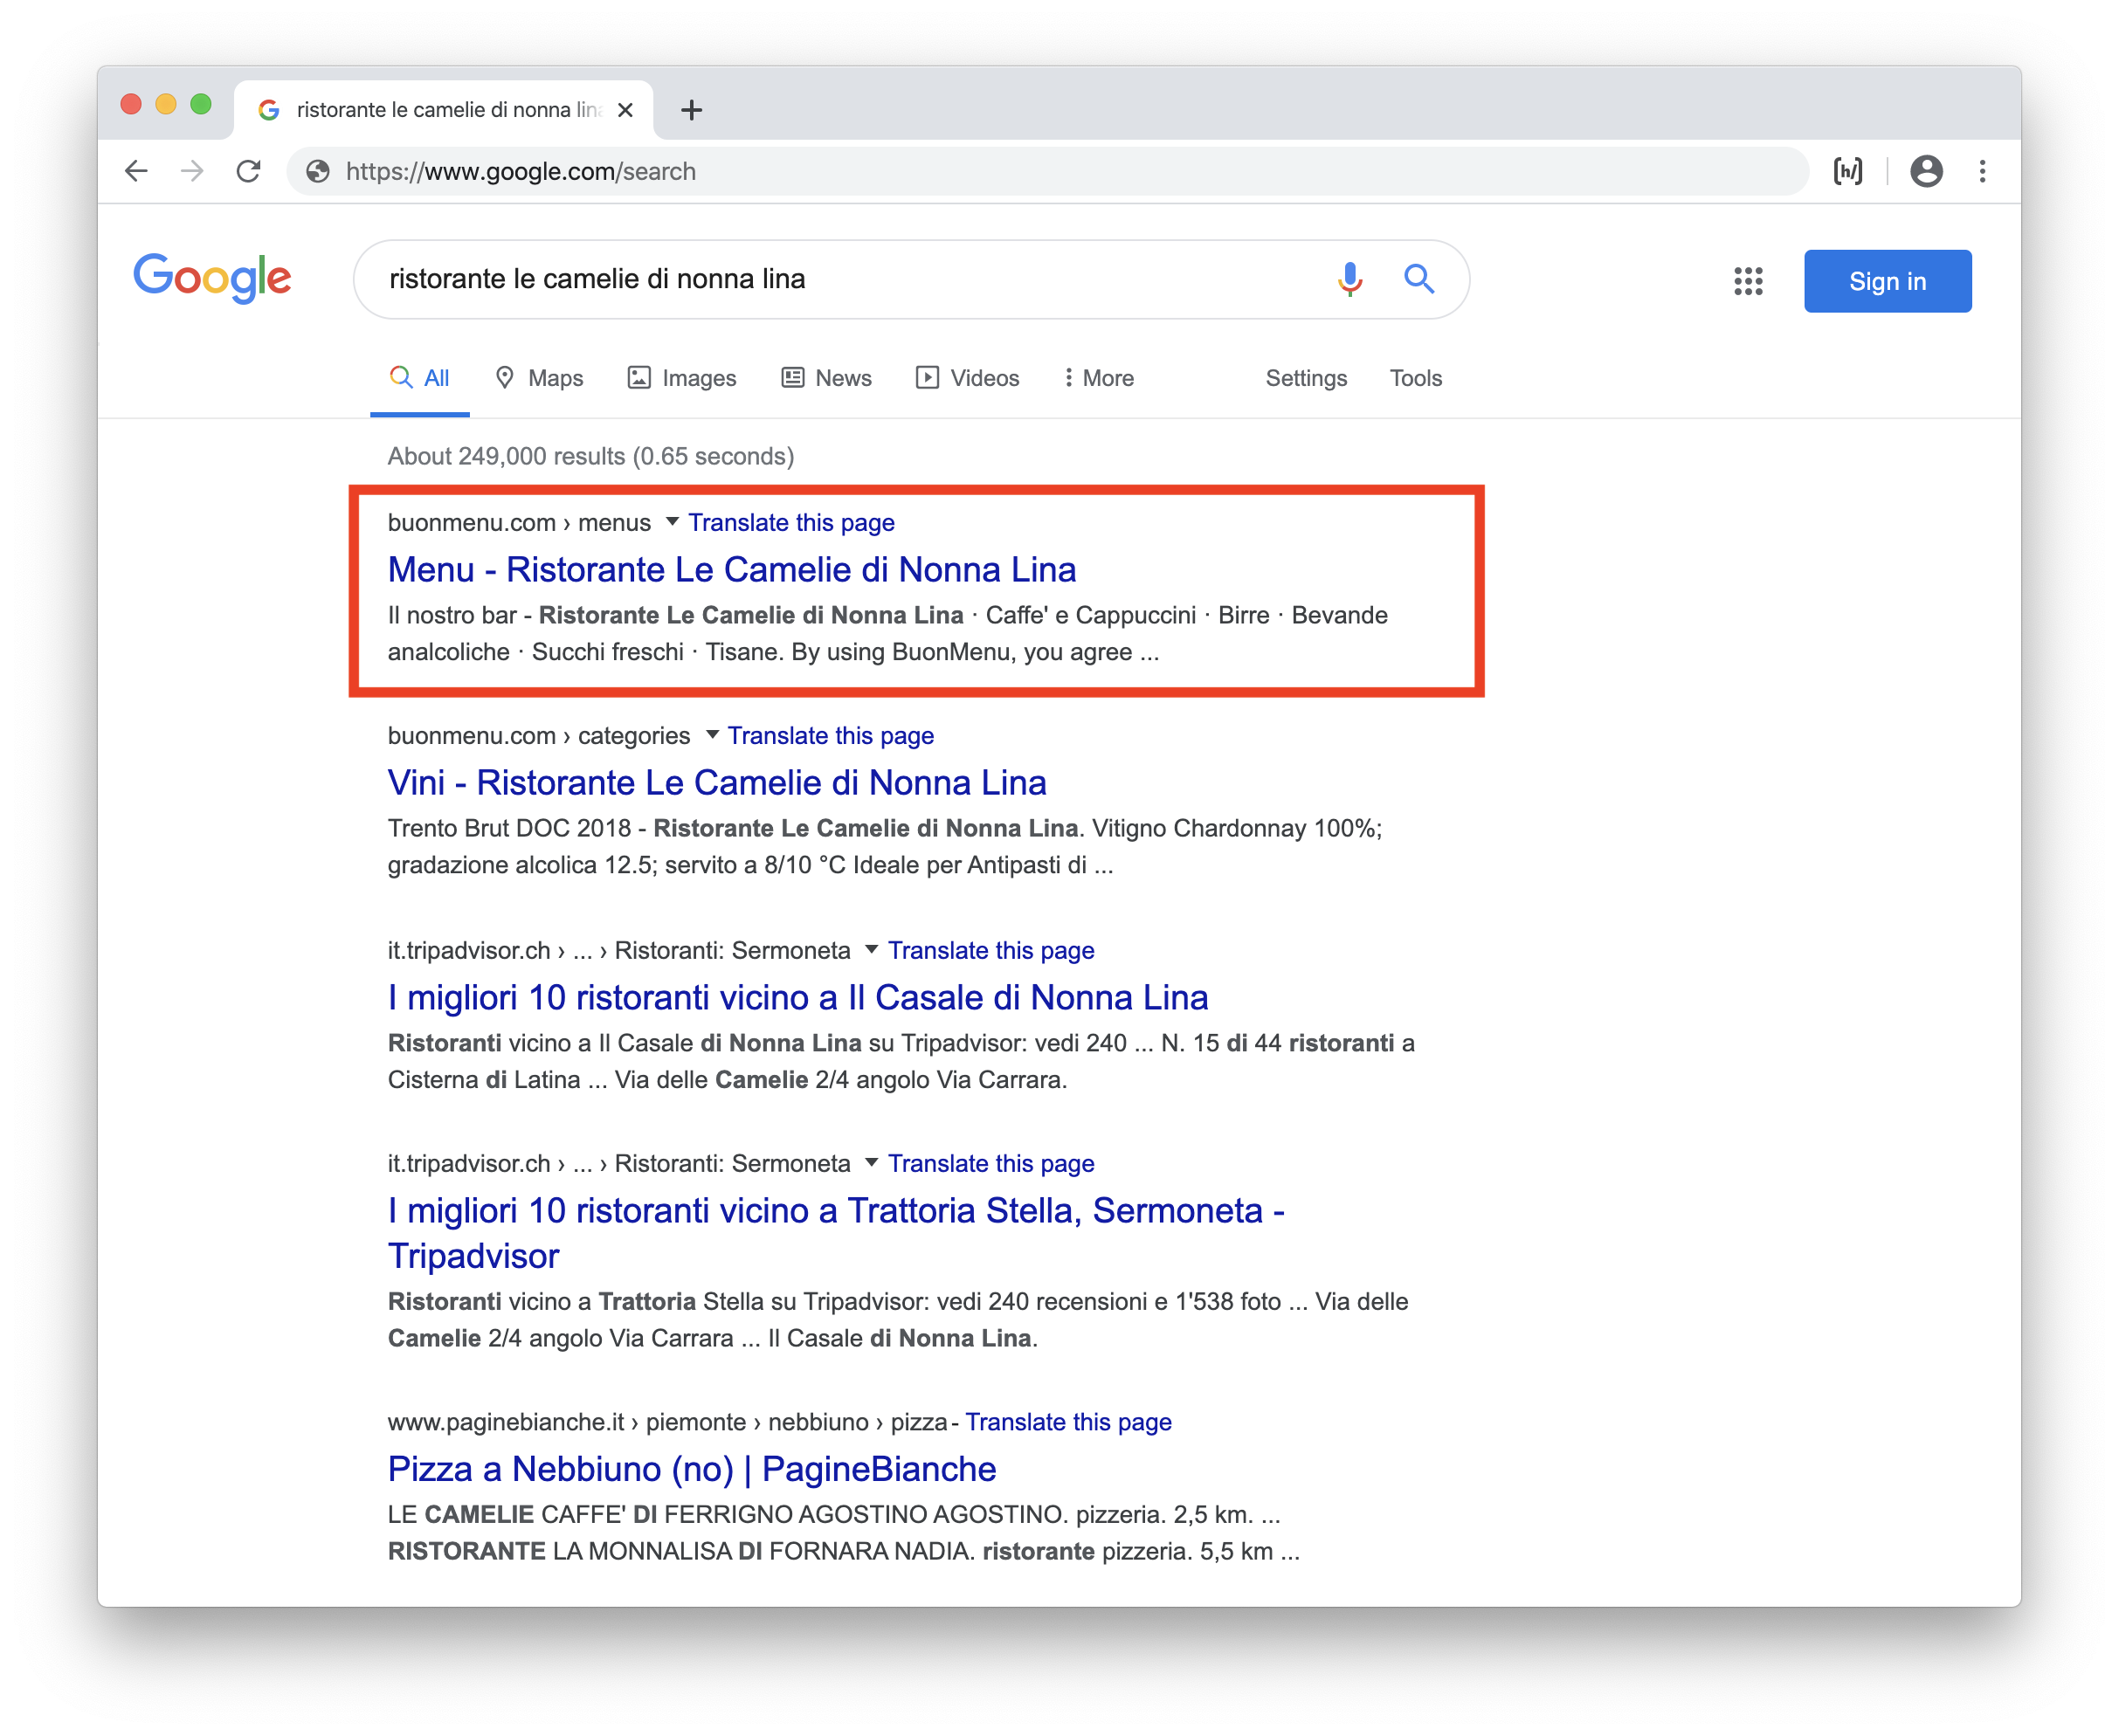 Restaurant menu in search results